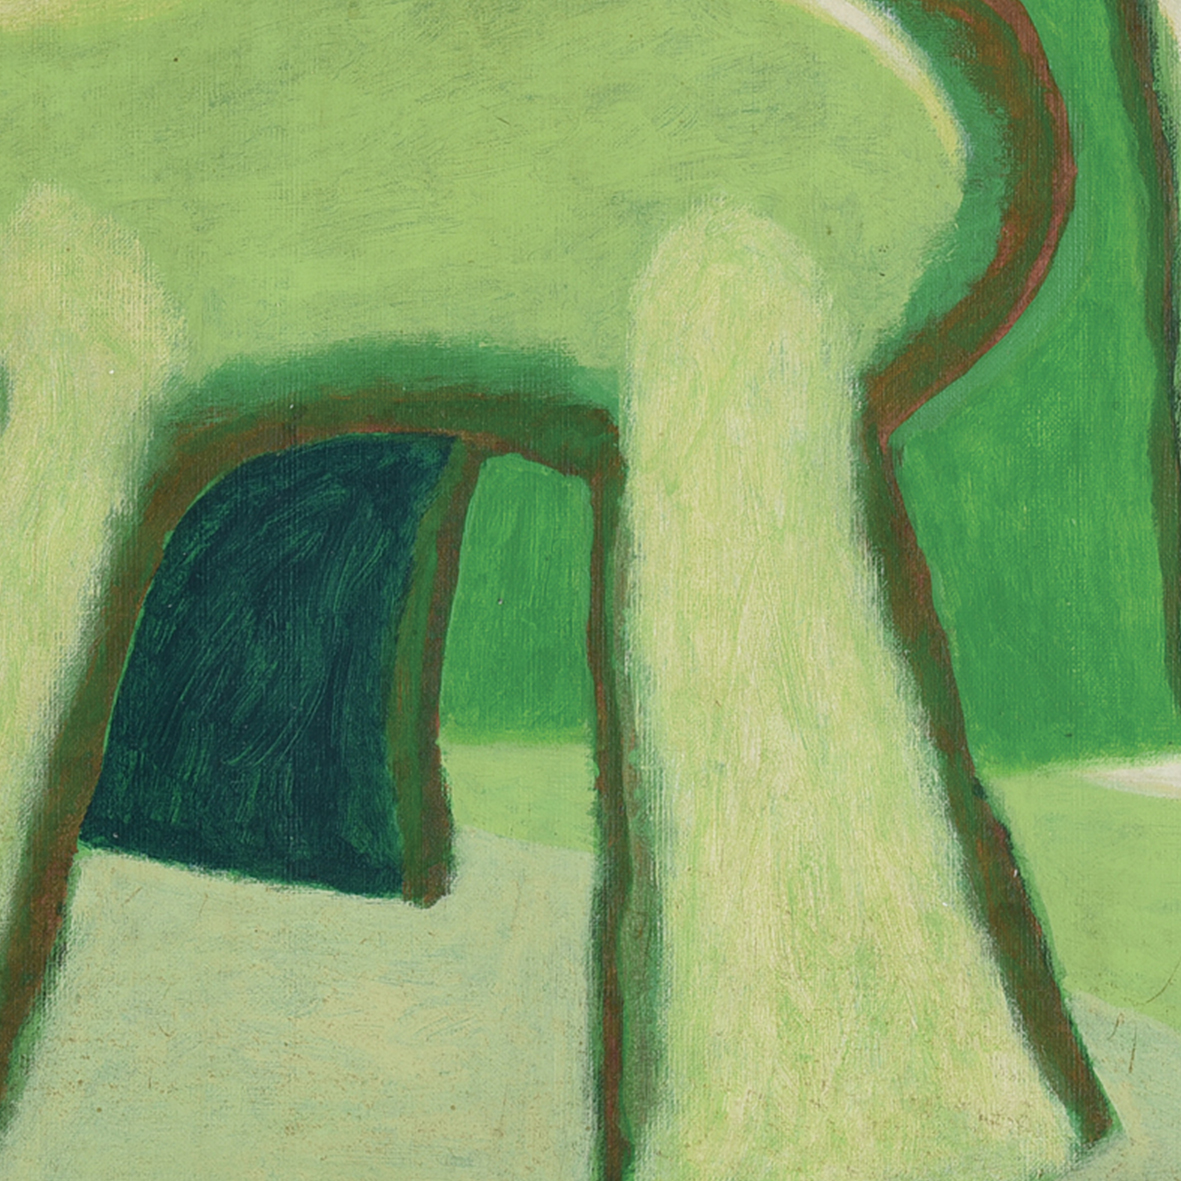 Nashar, Green Rhythm, oil on canvas, 64 x 94 cm, 1987 (detail)